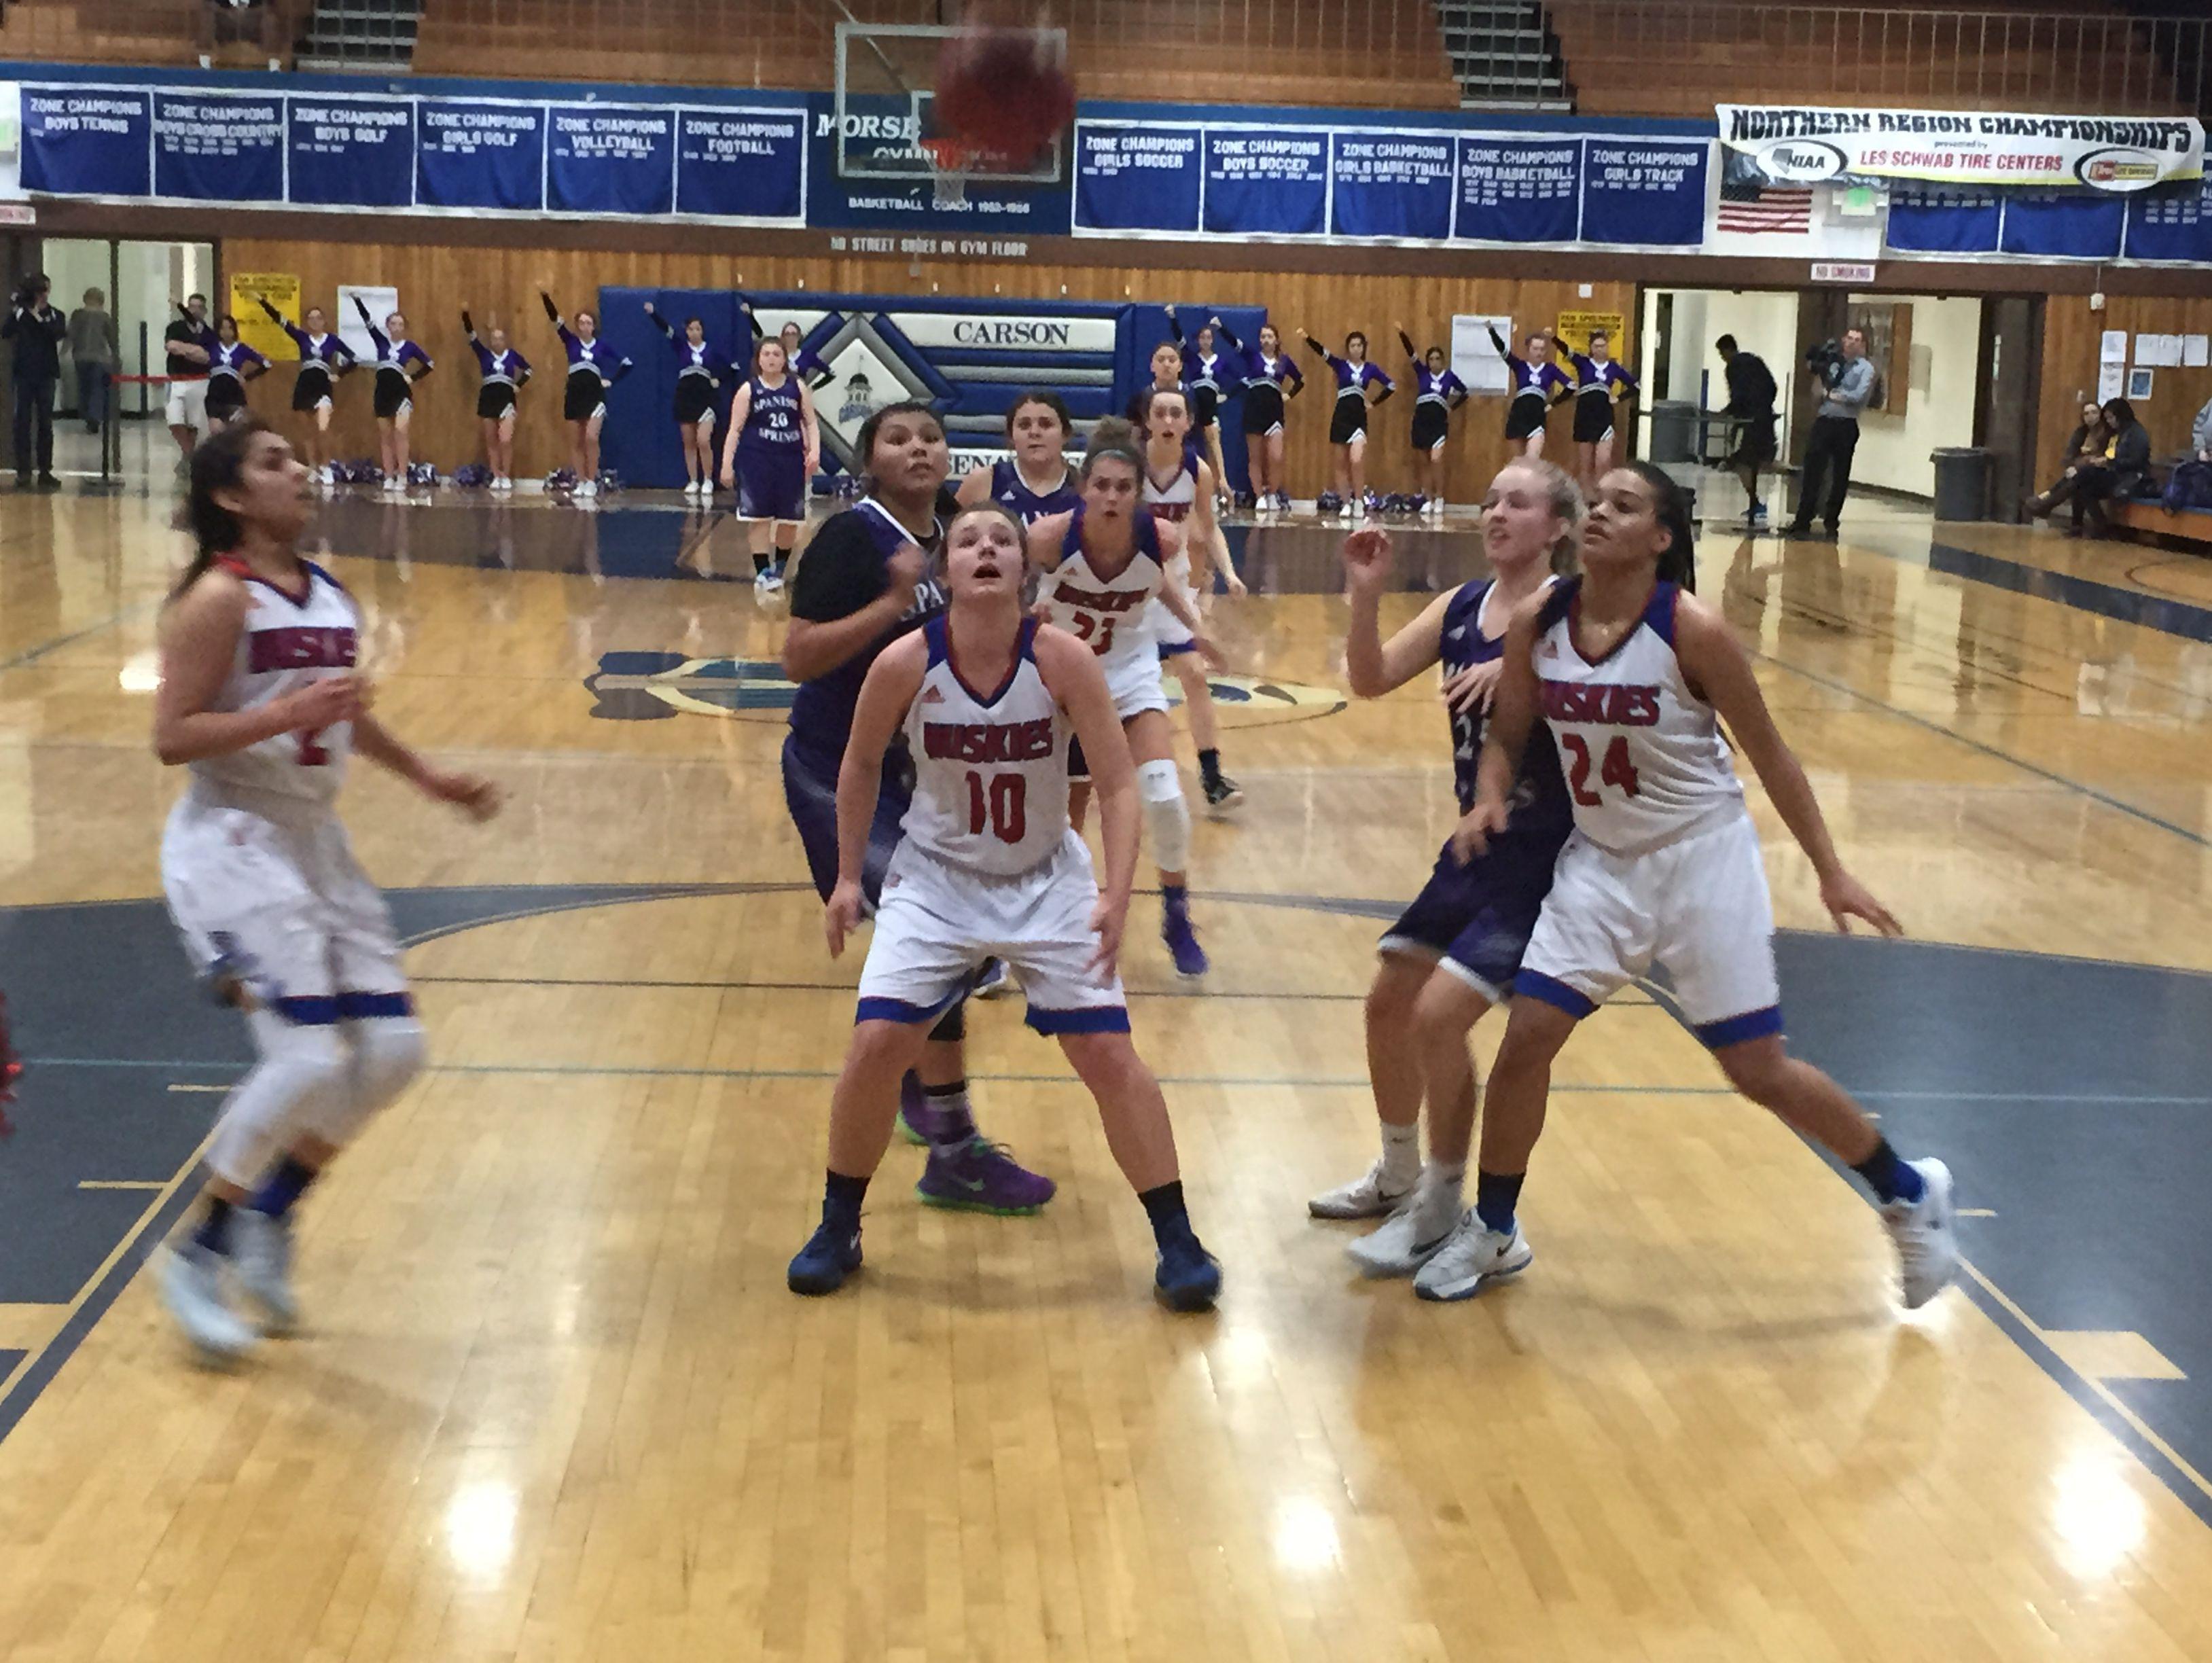 Reno beat Spanish Springs, 51-26, Friday in a girls basketball Northern 4A Regional semifinal at Carson